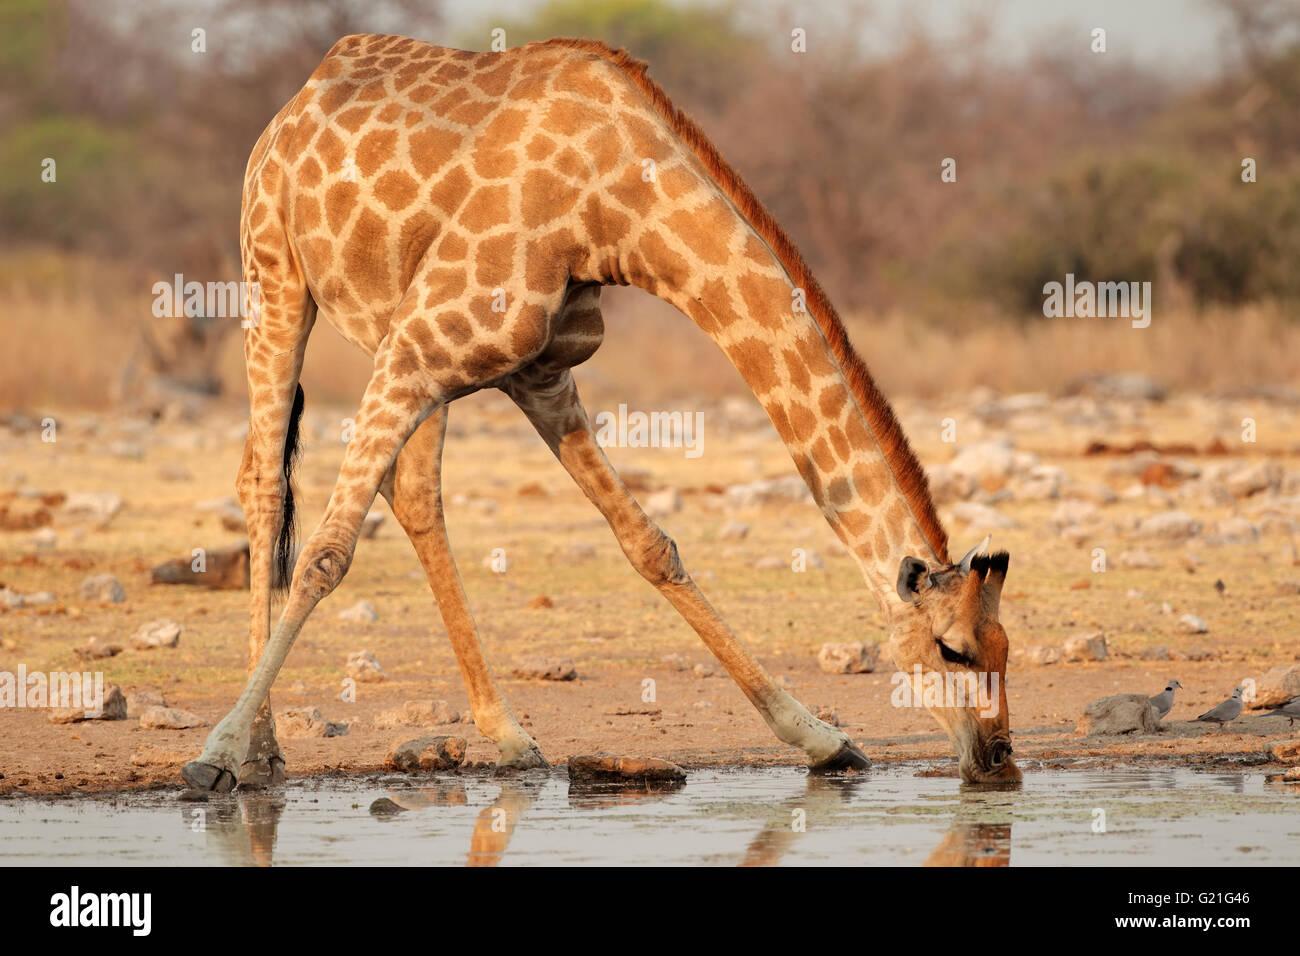 Jirafa (Giraffa camelopardalis) el agua potable, el Parque Nacional de Etosha, Namibia Imagen De Stock